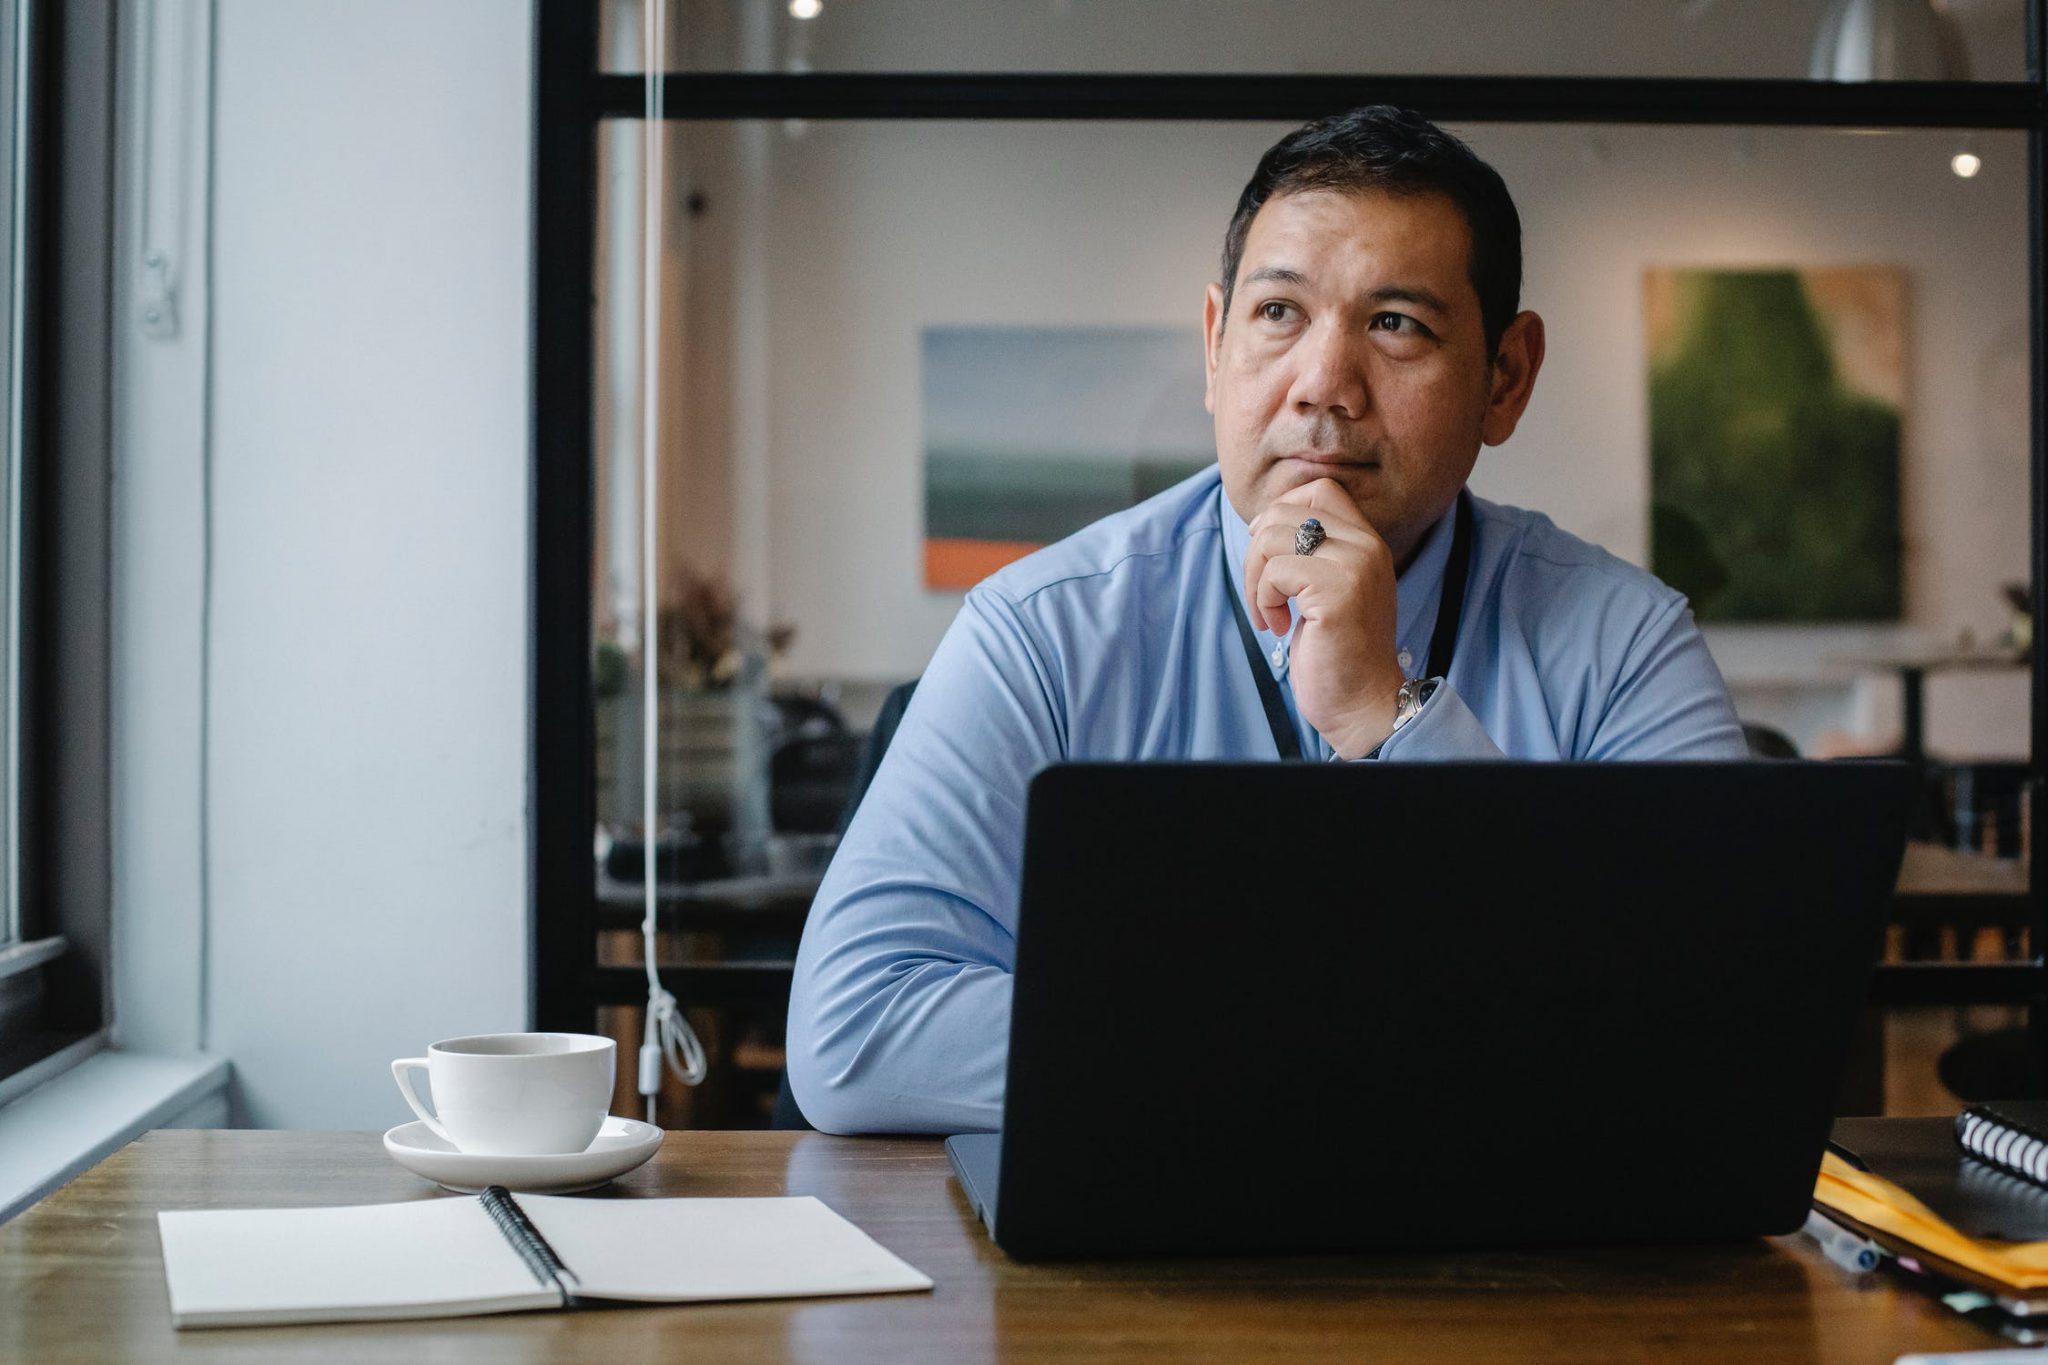 Premiekorting Aof biedt verlichting voor kleine werkgevers